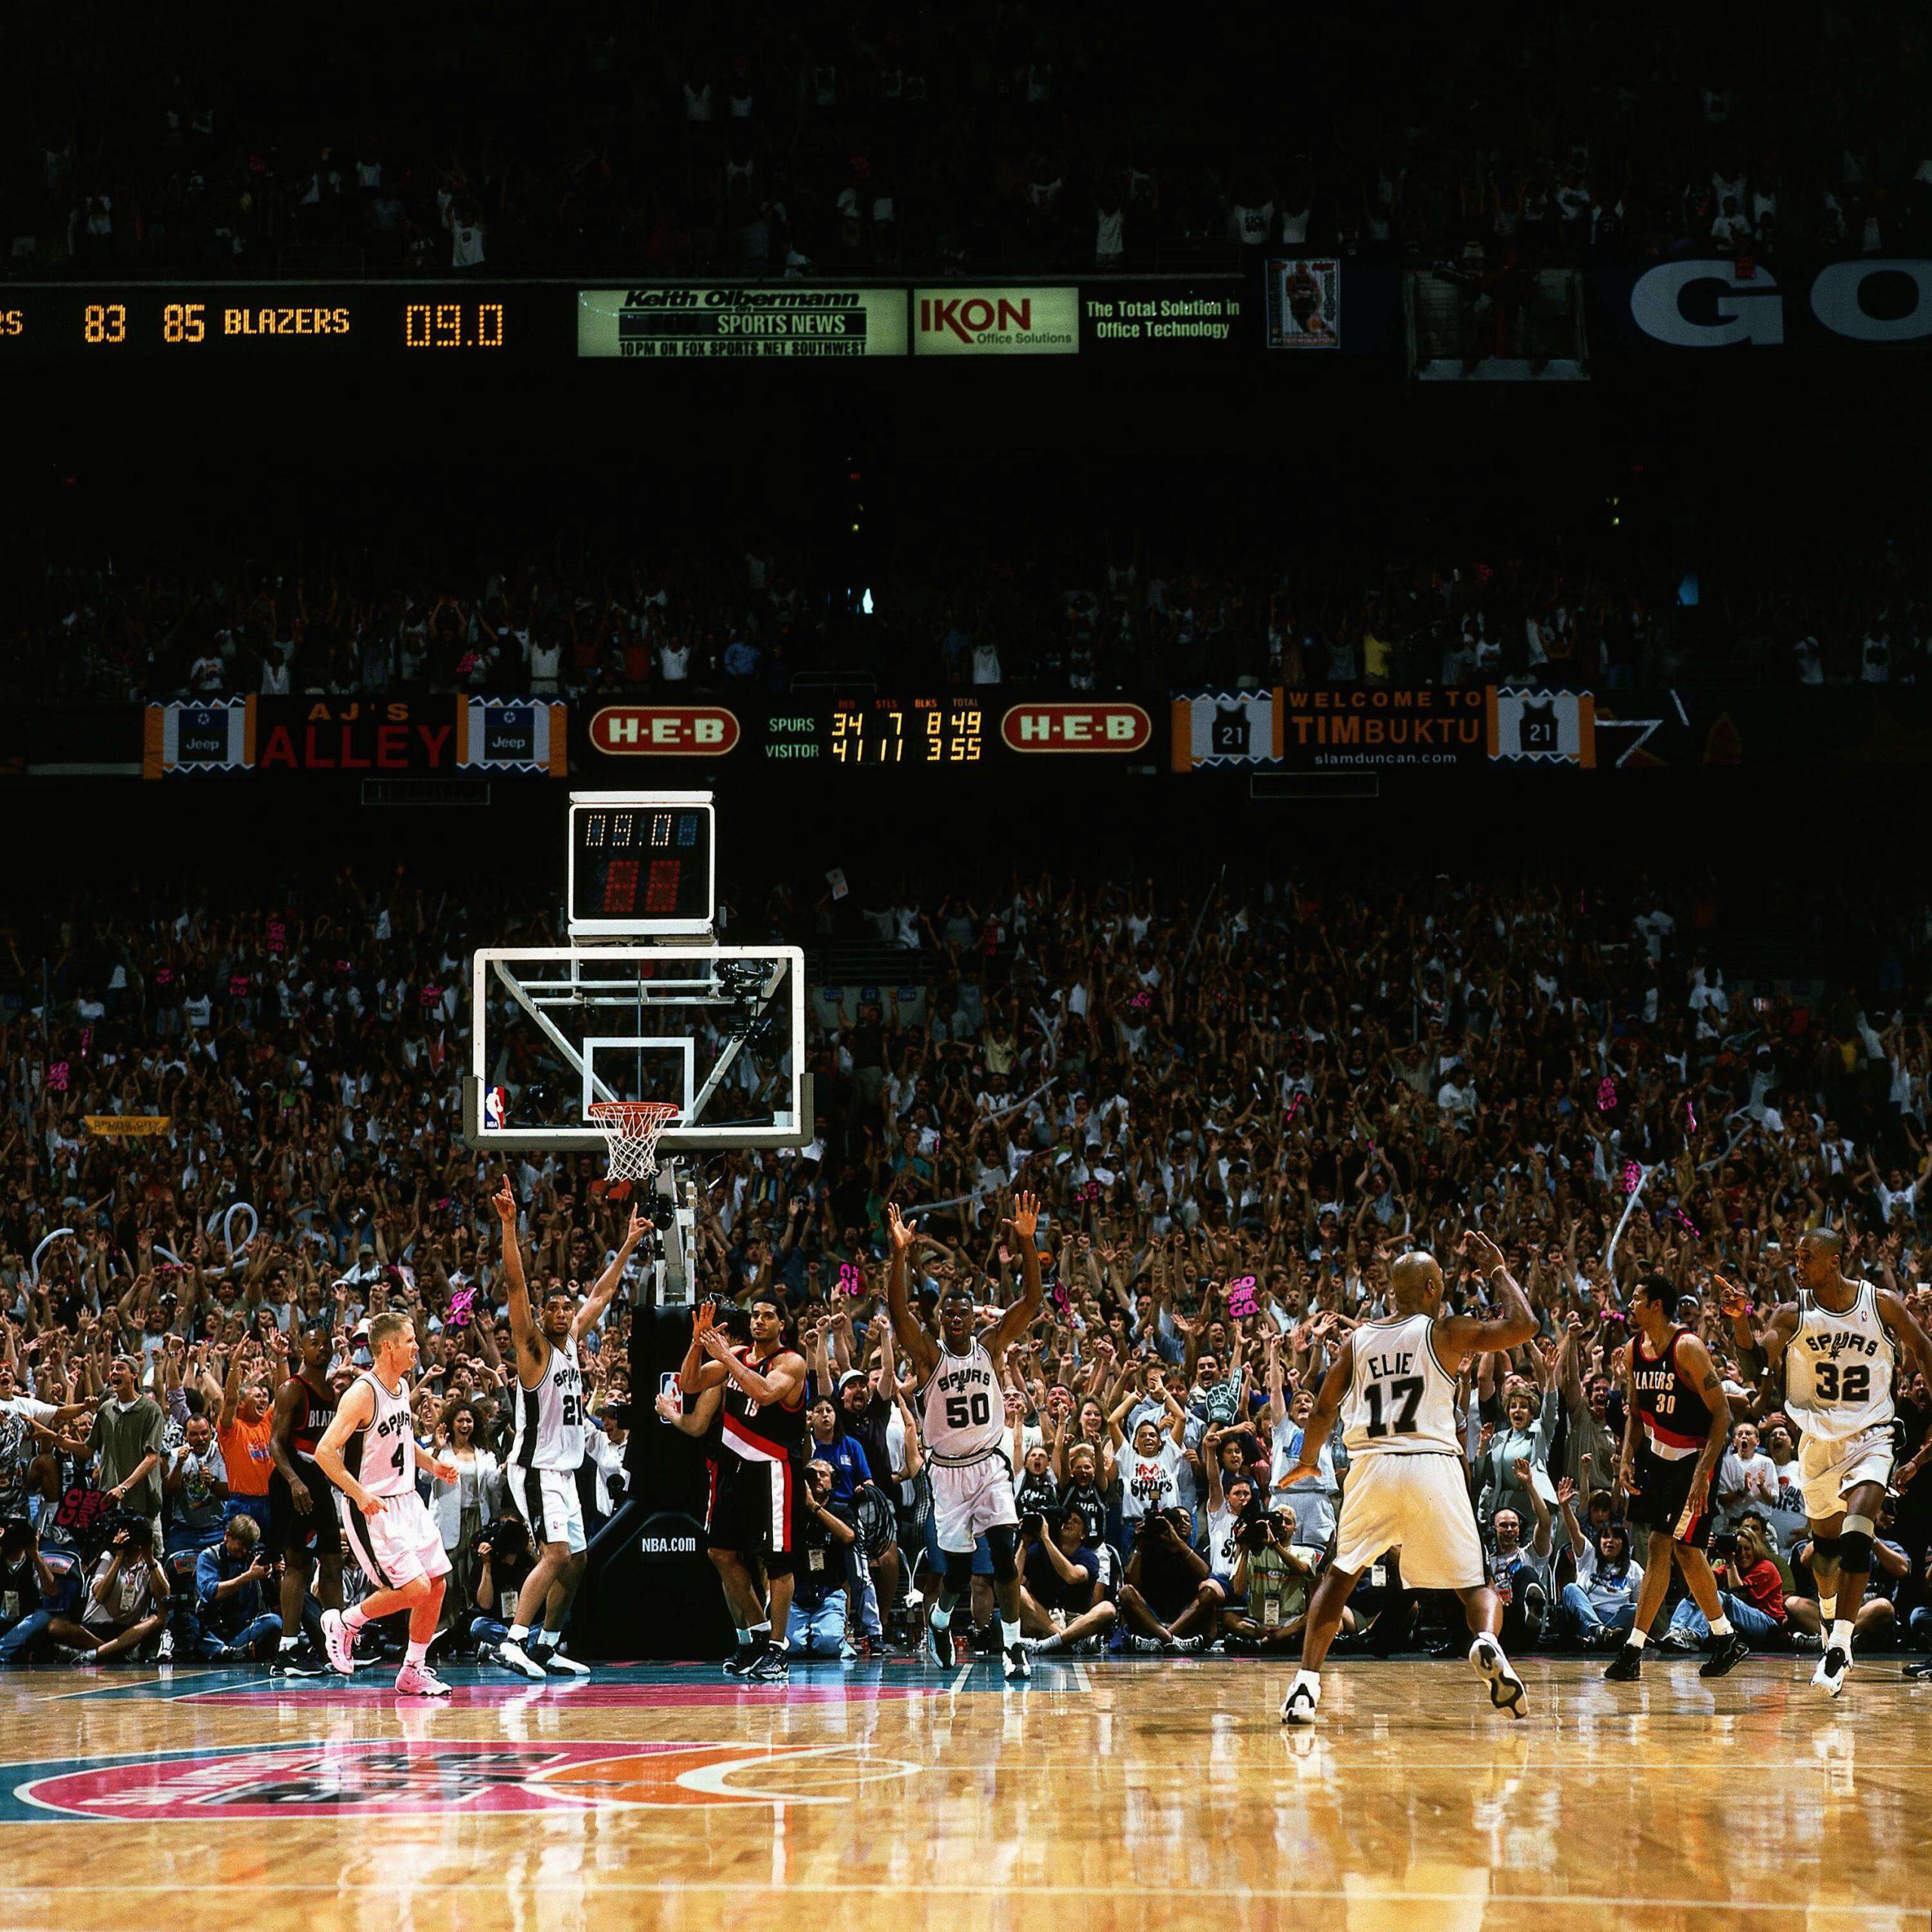 Spurs vs the Portland Trail Blazers at the Alamodome circa 1999. Photo courtesy San Antonio Spurs.